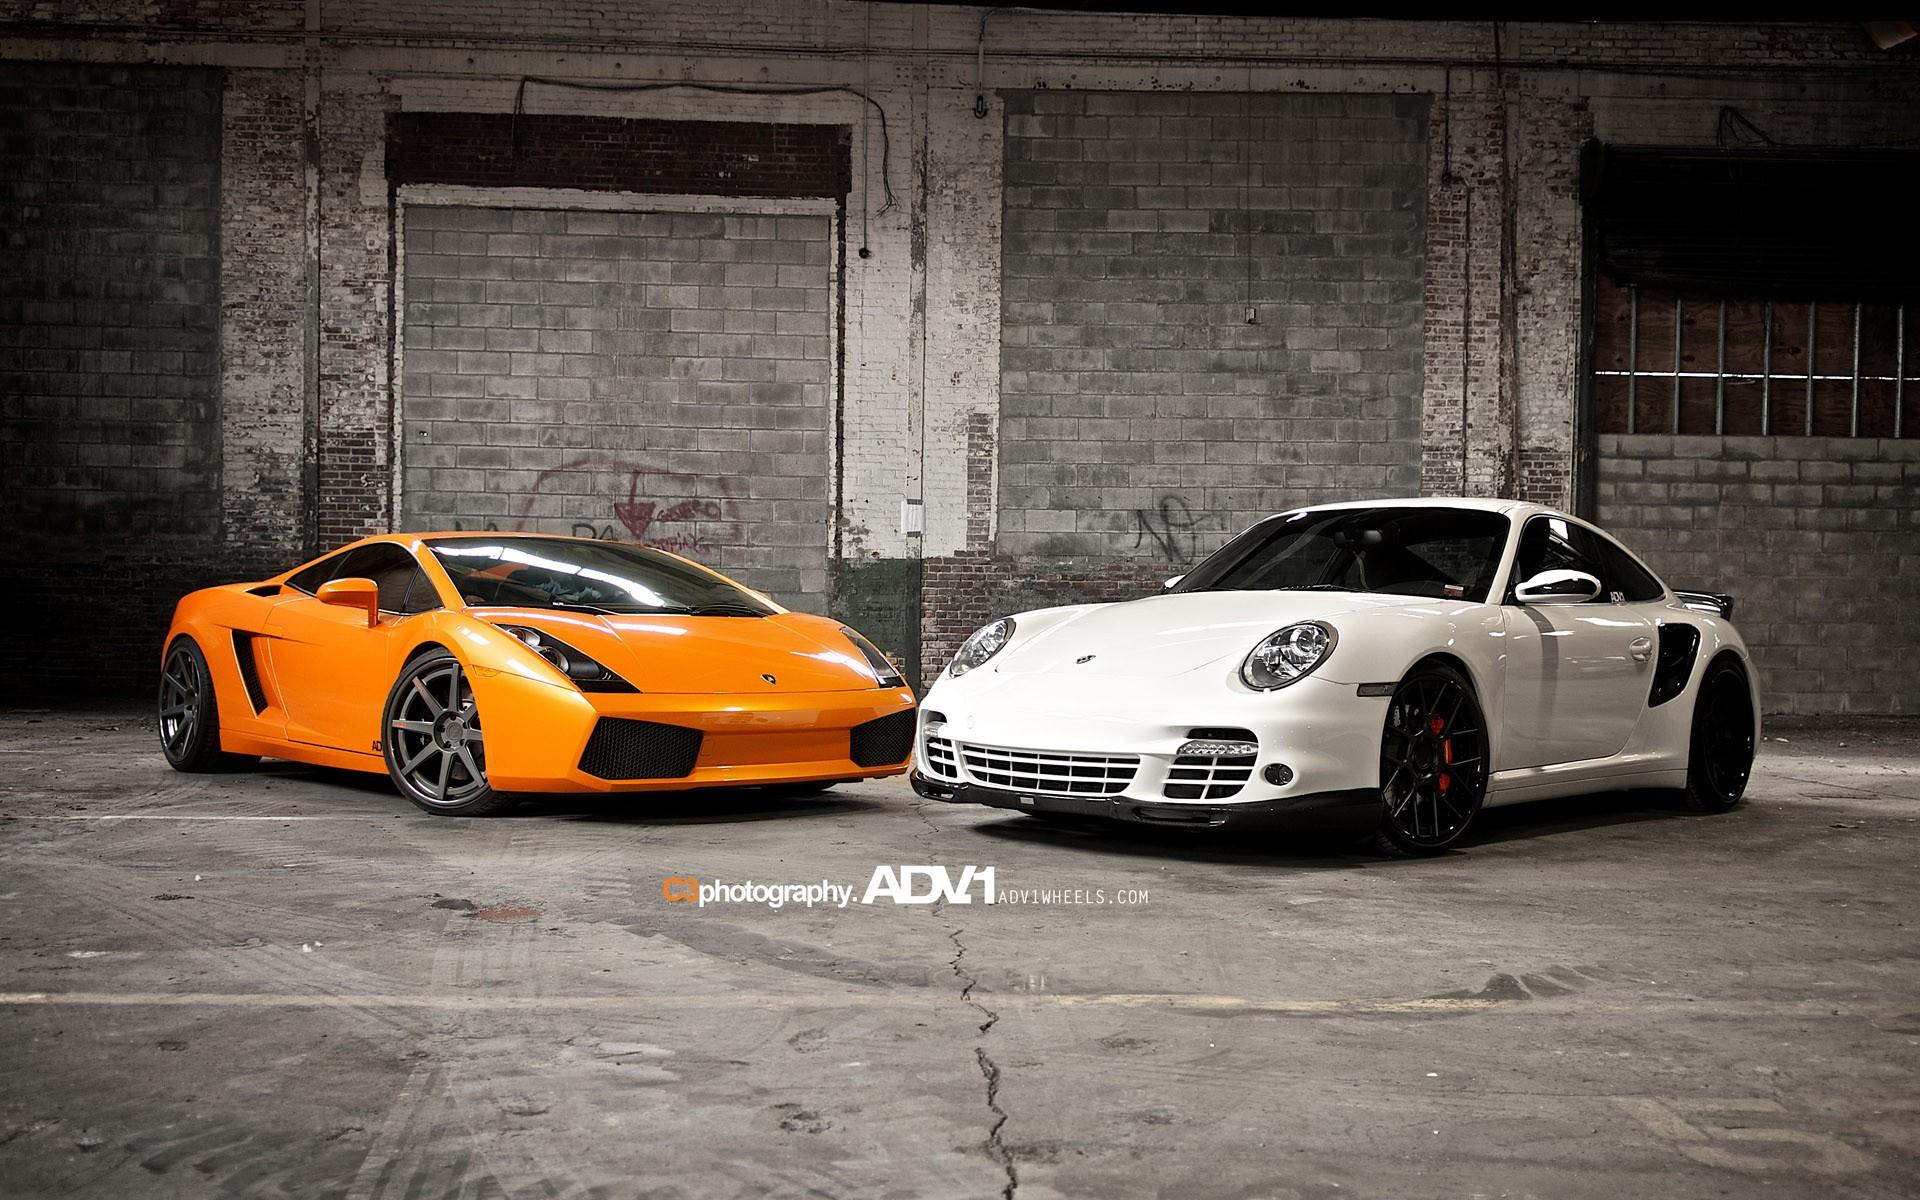 Tuning Car Iphone Wallpaper Lamborghini Gallardo And Porsche 997 Tt Wallpaper Hd Car